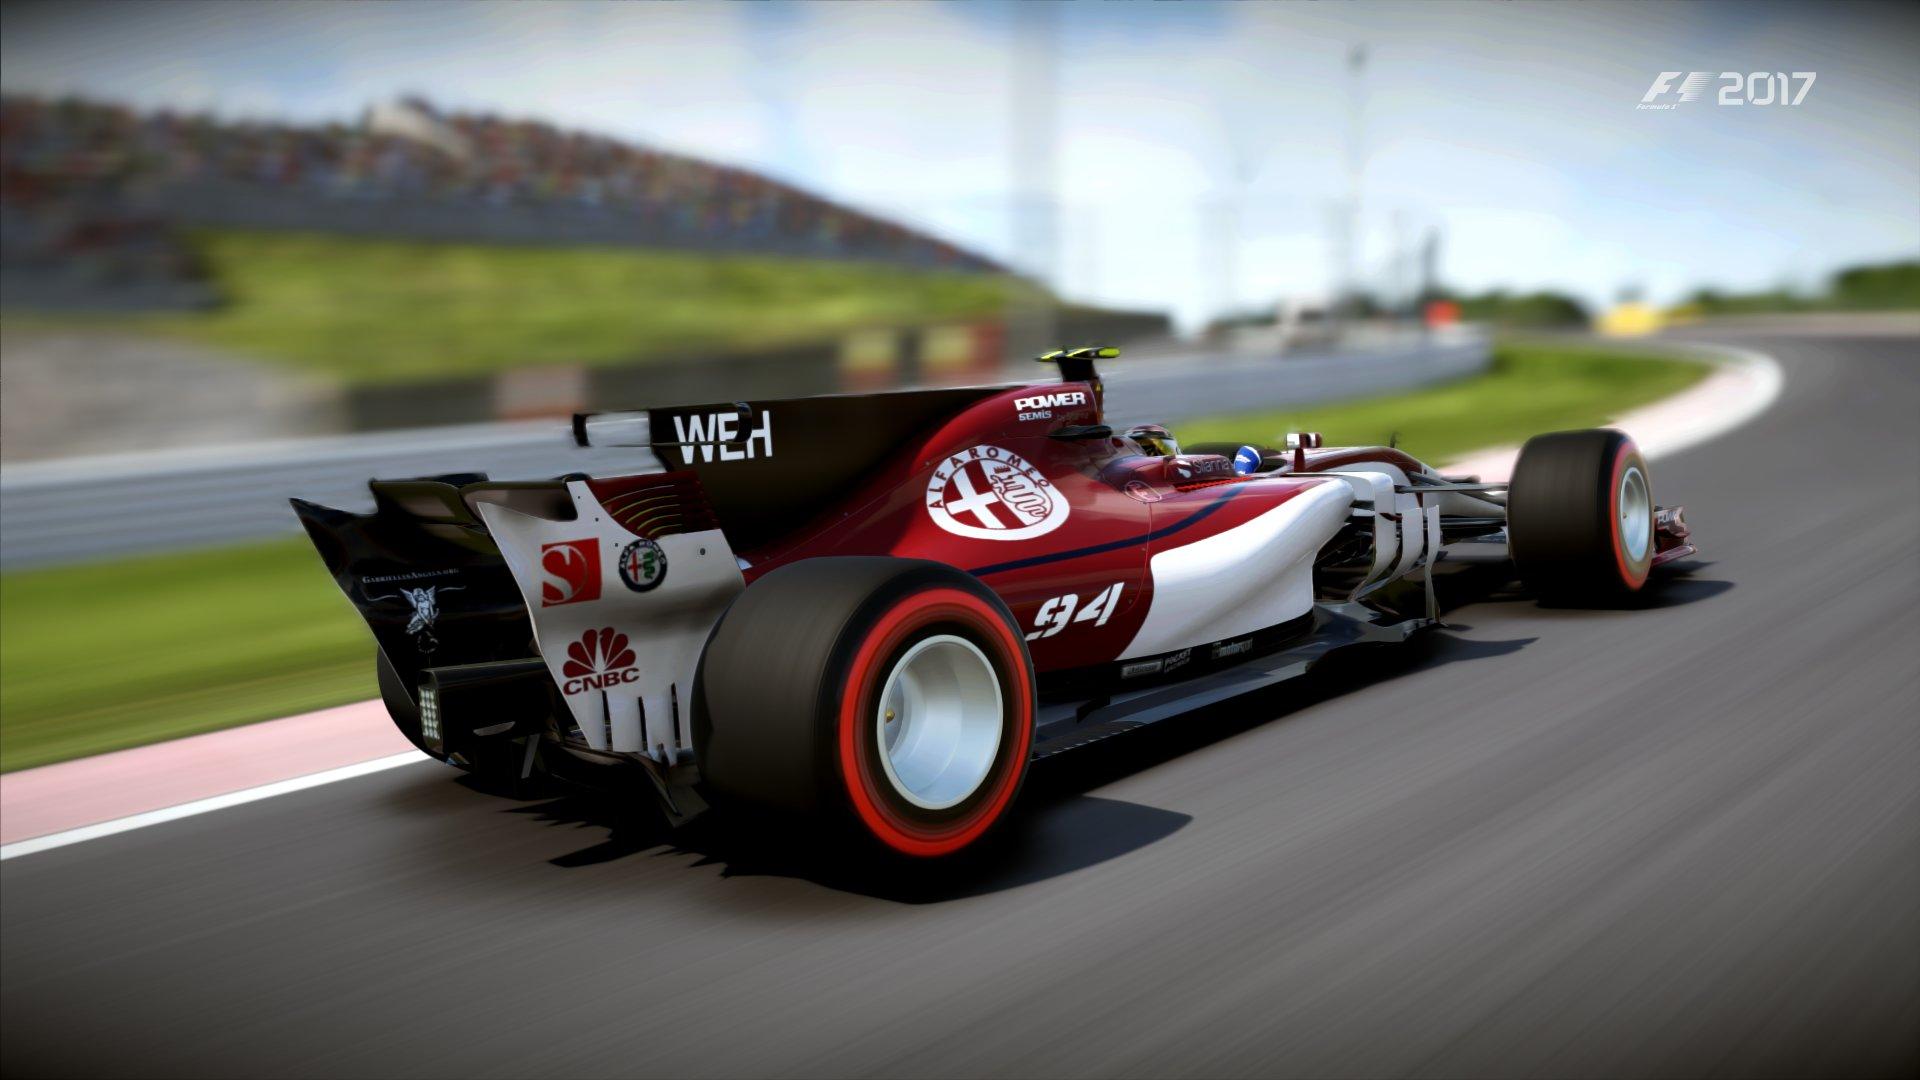 alfa romeo sauber f1 team racedepartment. Black Bedroom Furniture Sets. Home Design Ideas